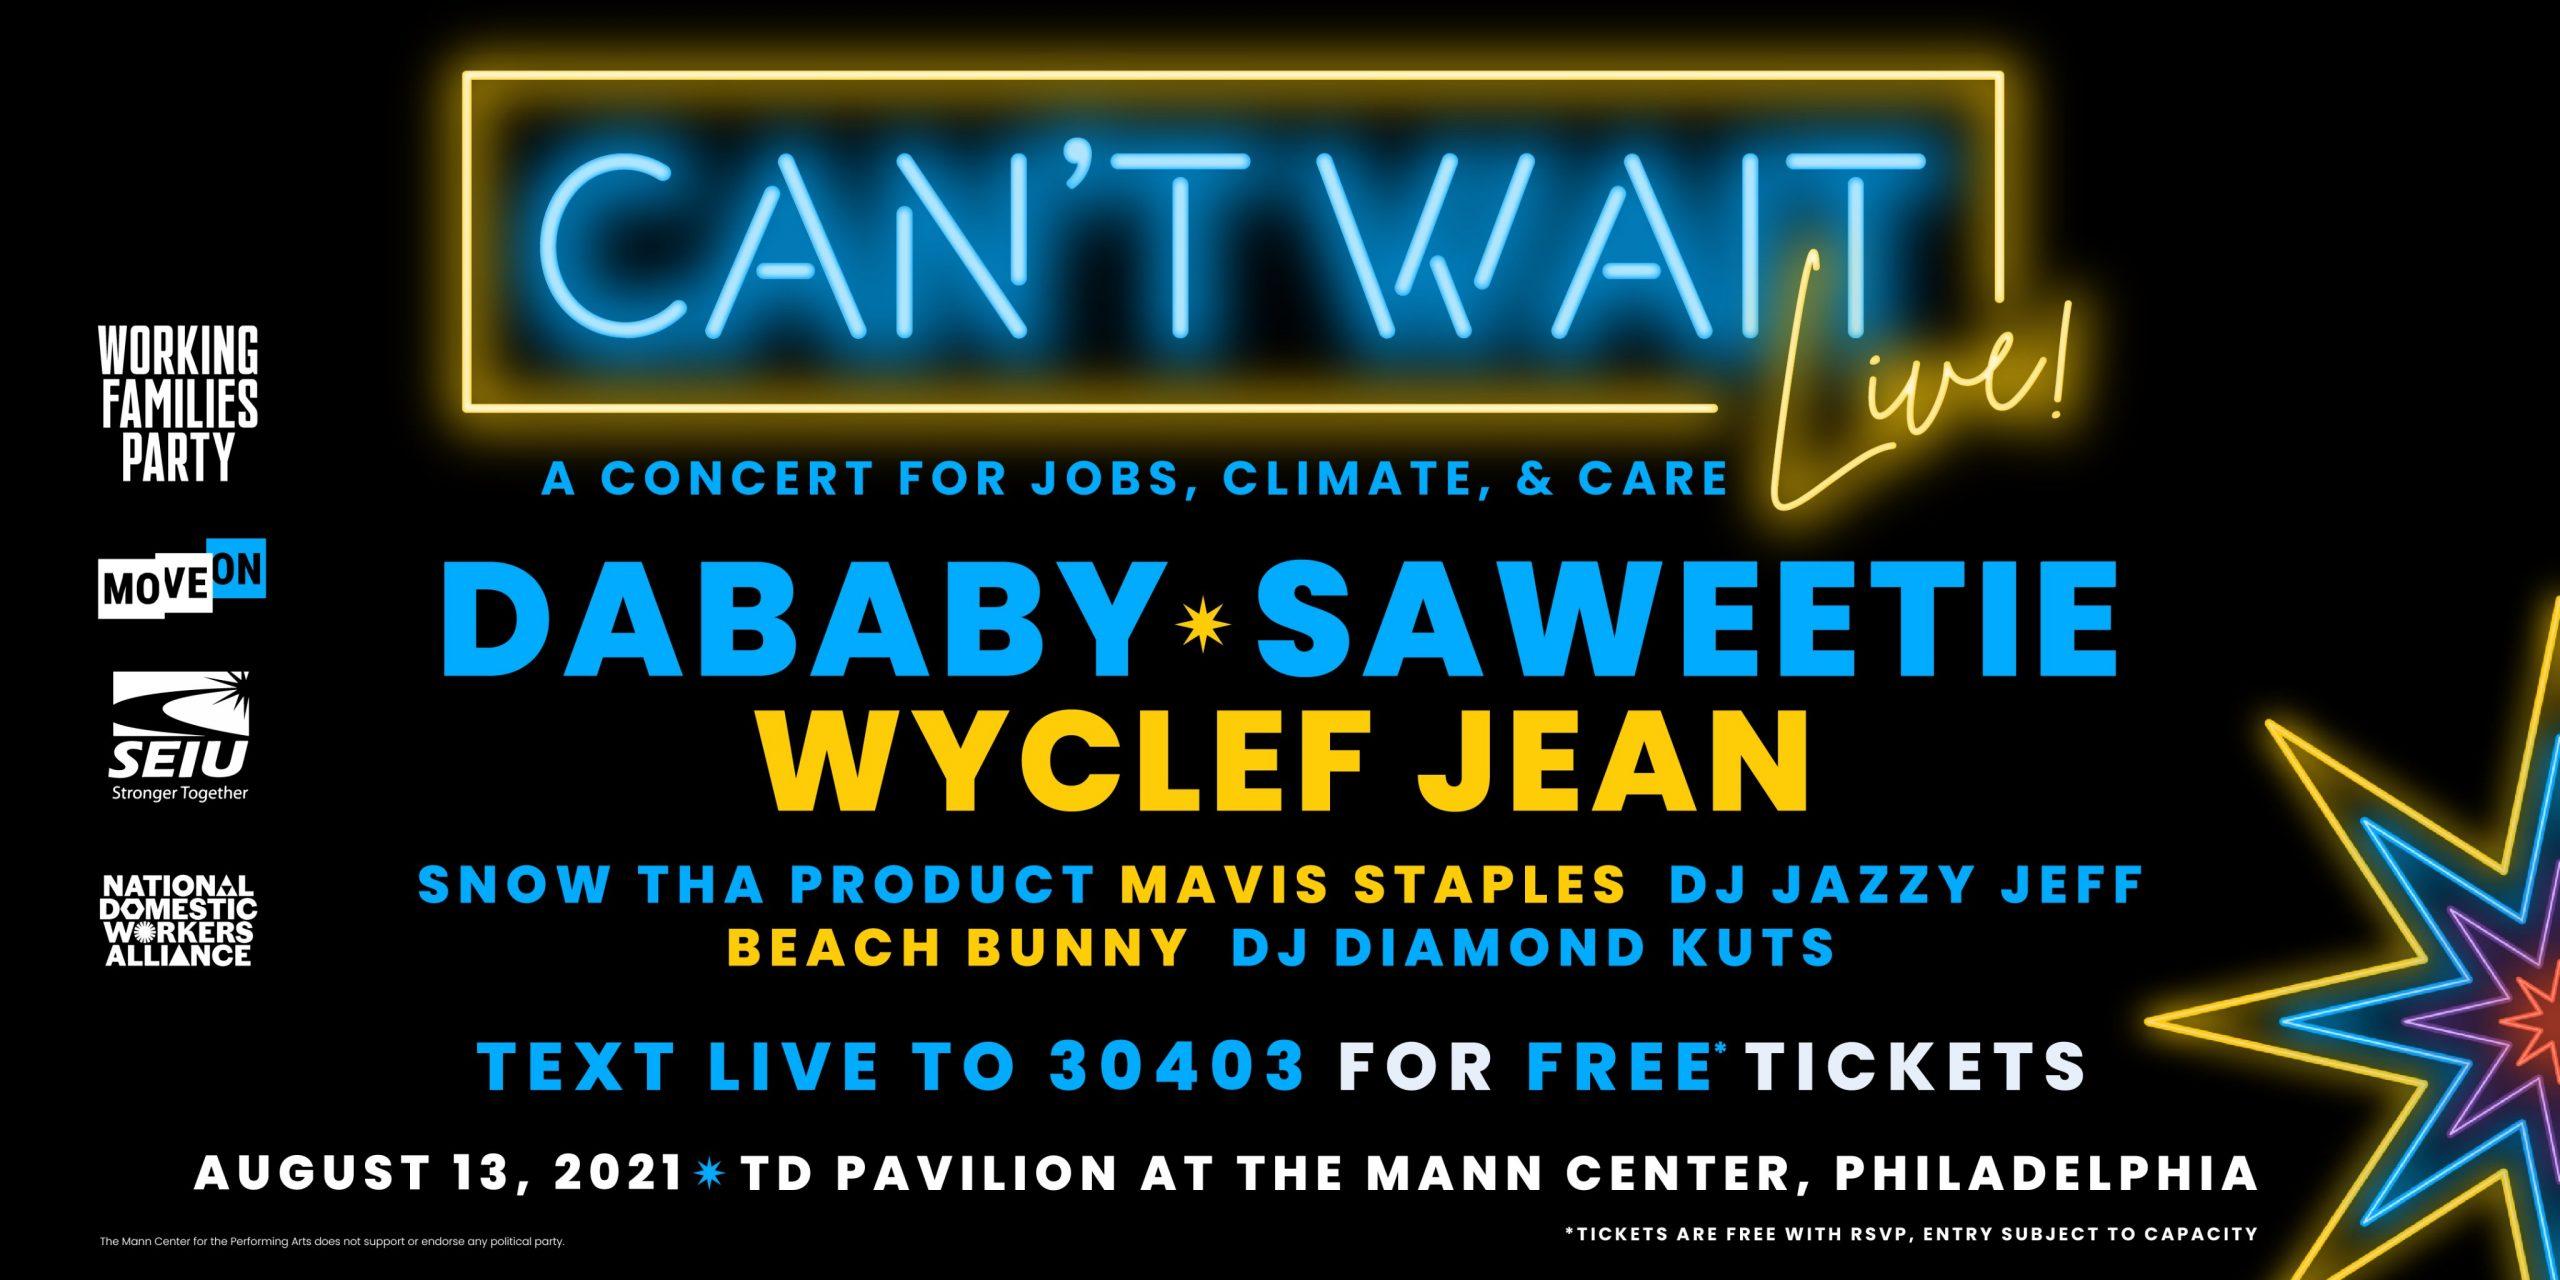 Can't Wait Live sponsored by Patriotic Millionaires